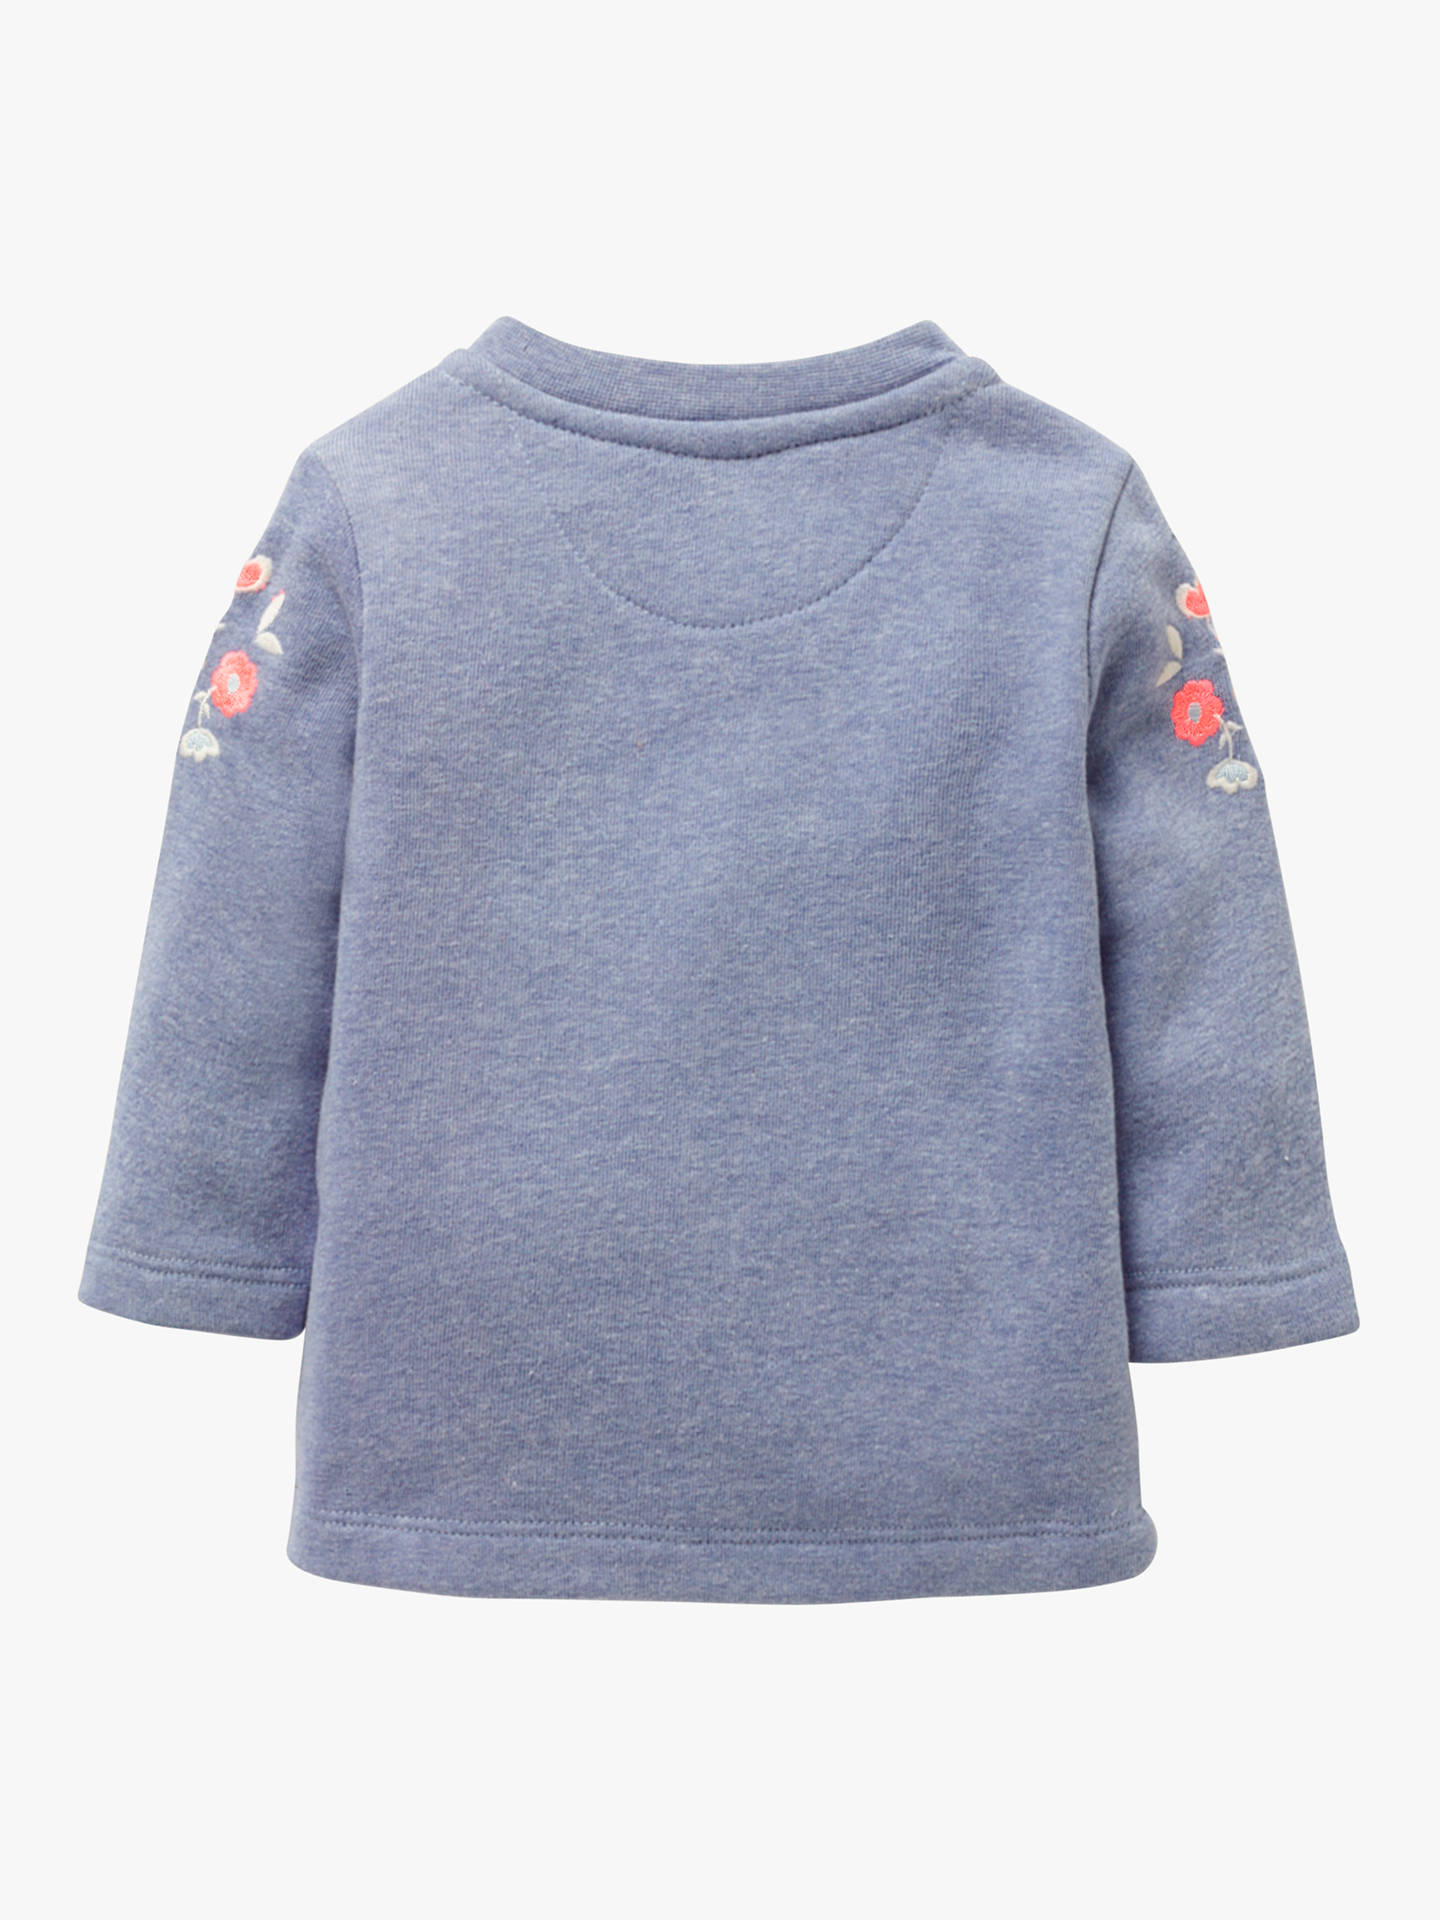 7c1d3928f0 Mini Boden Baby Floral Sweatshirt, Elizabeth Blue at John Lewis ...